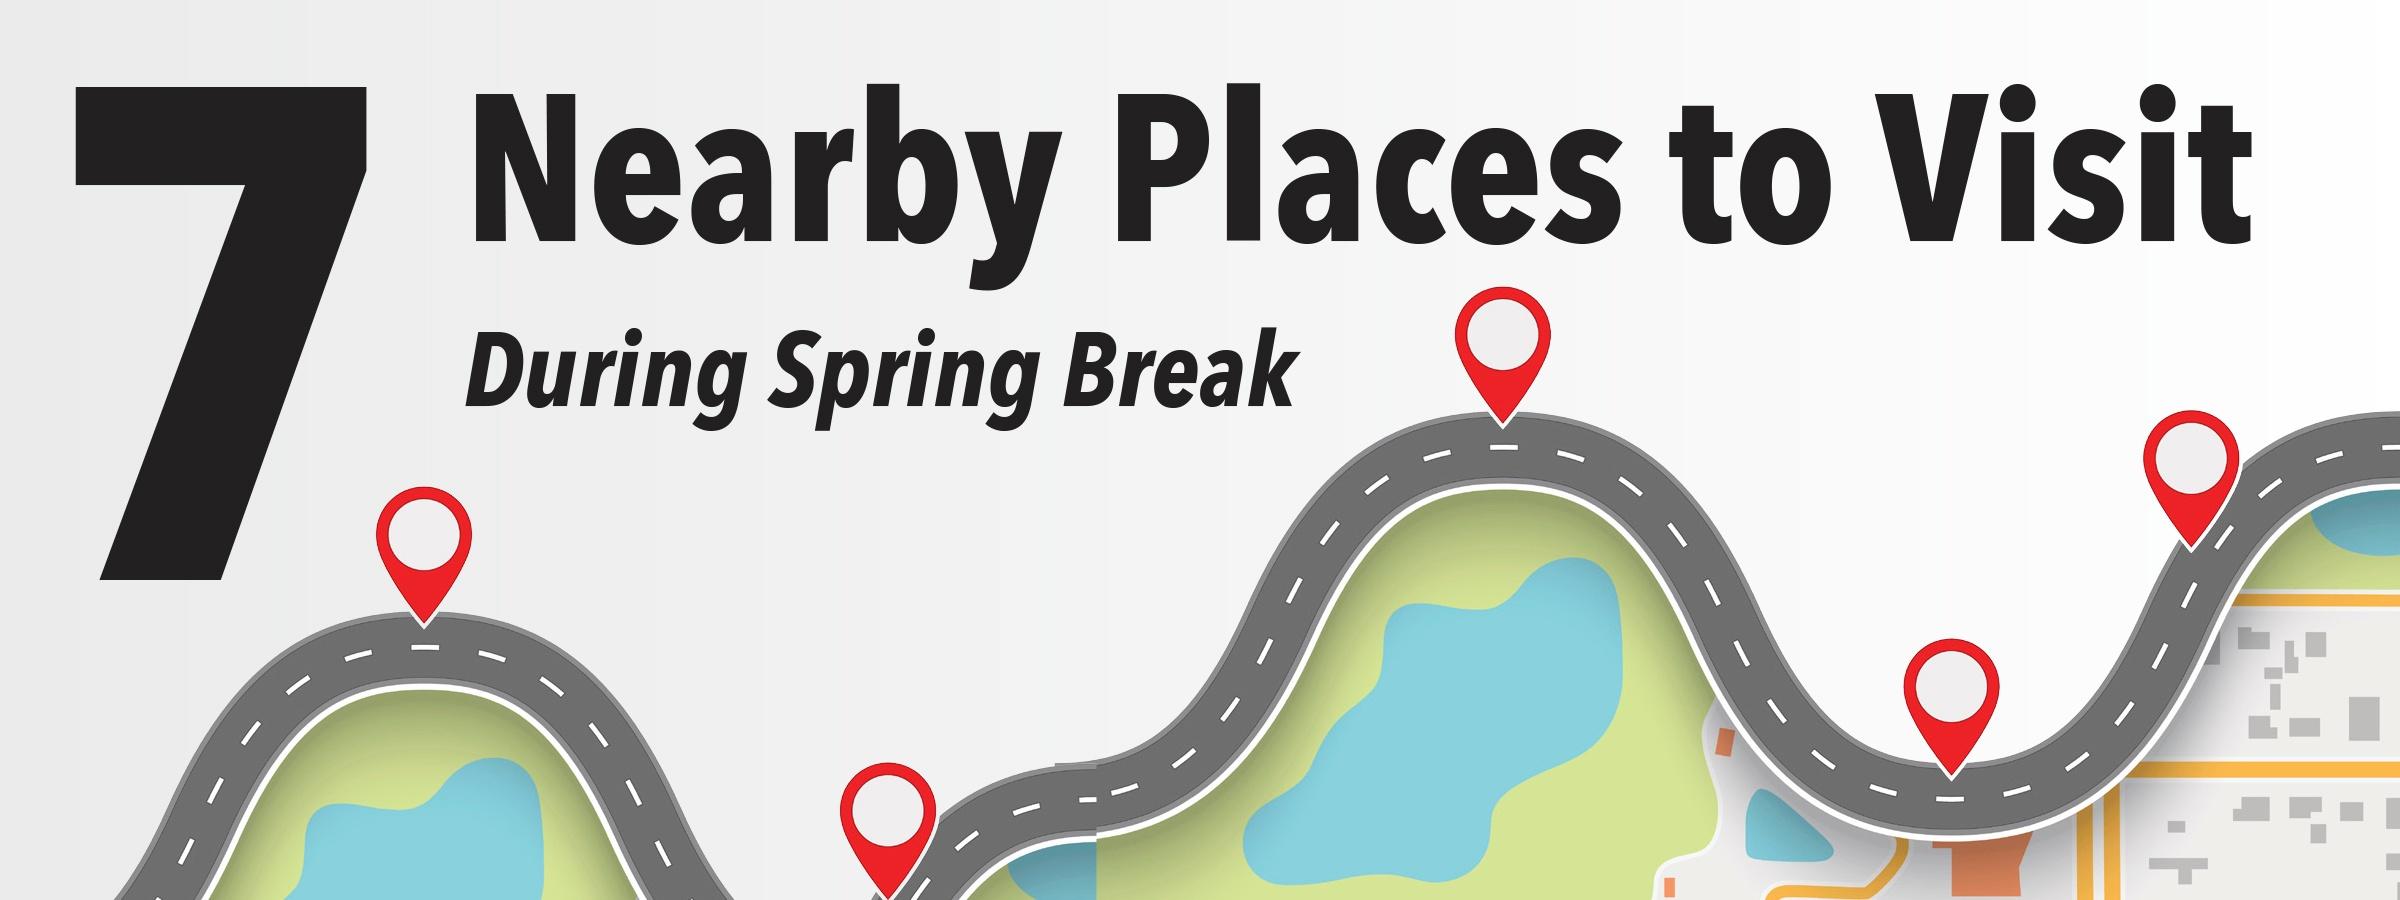 7 nearby places to visit during spring break joliet junior college jjc